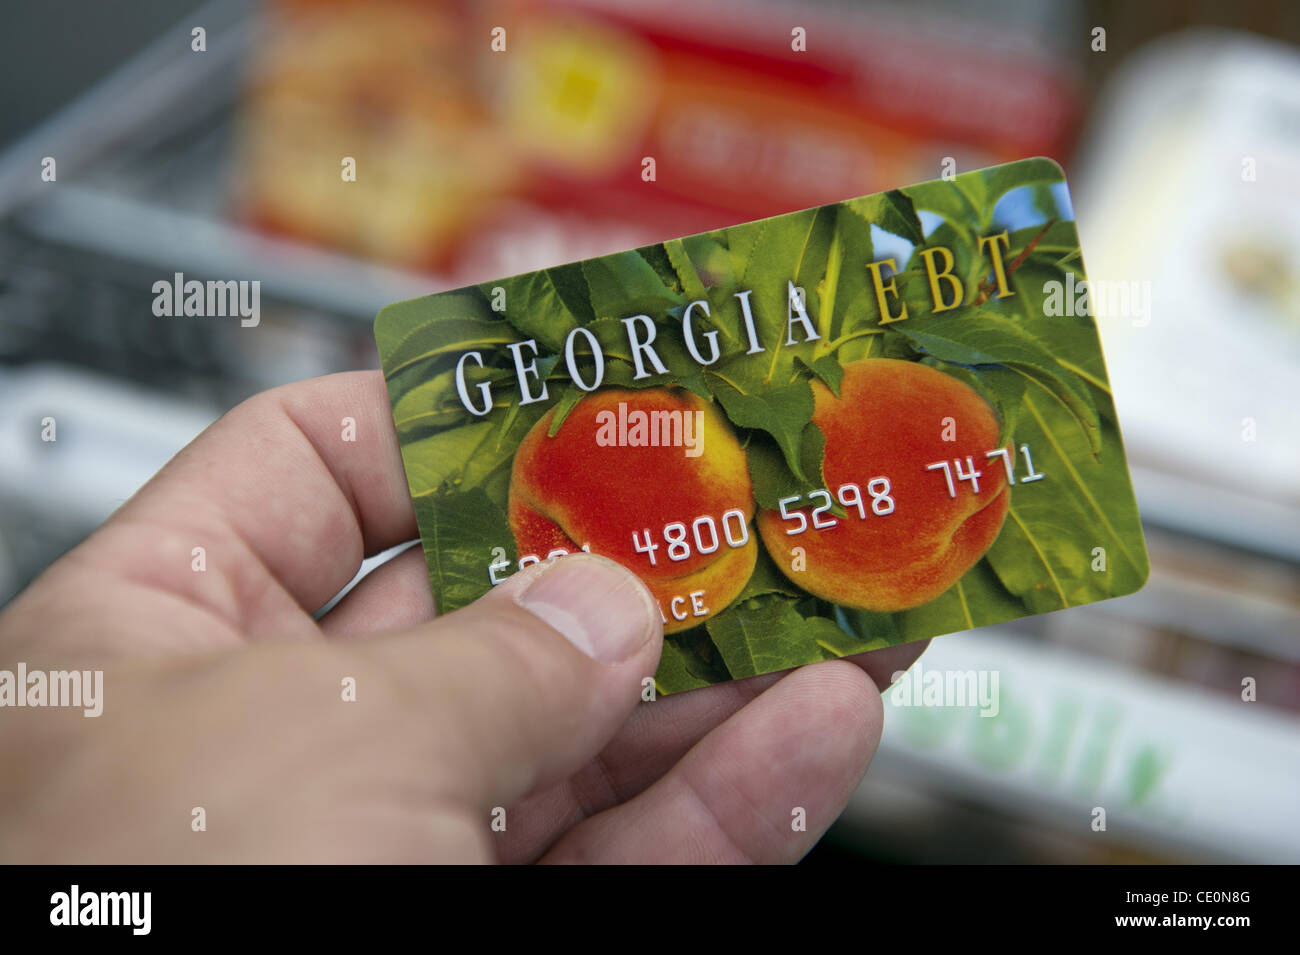 Sept 22 2011 Atlanta Ga Georgias New Food Stamp Card Stock